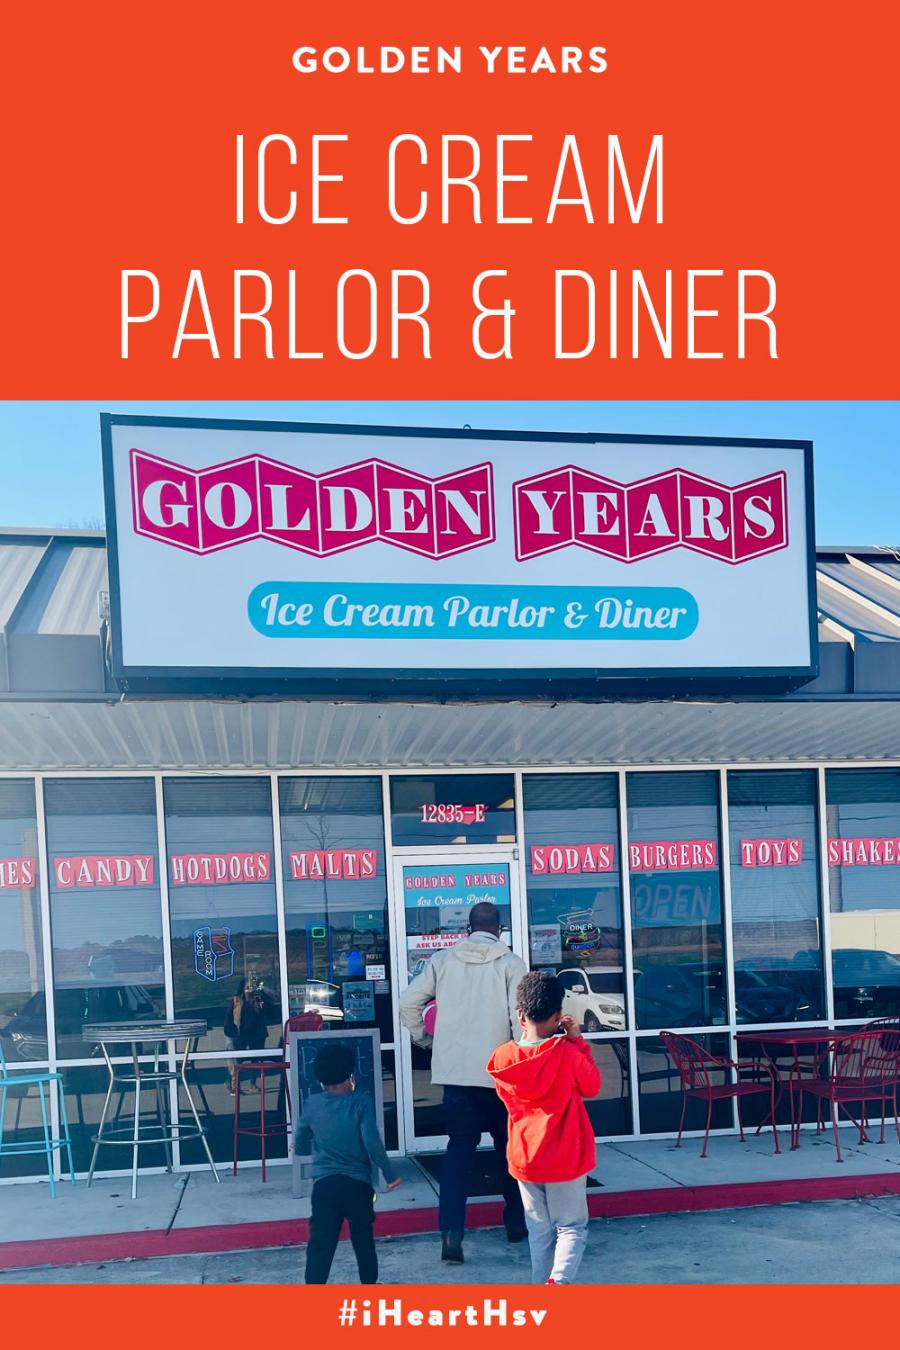 Golden Years Ice Cream Diner